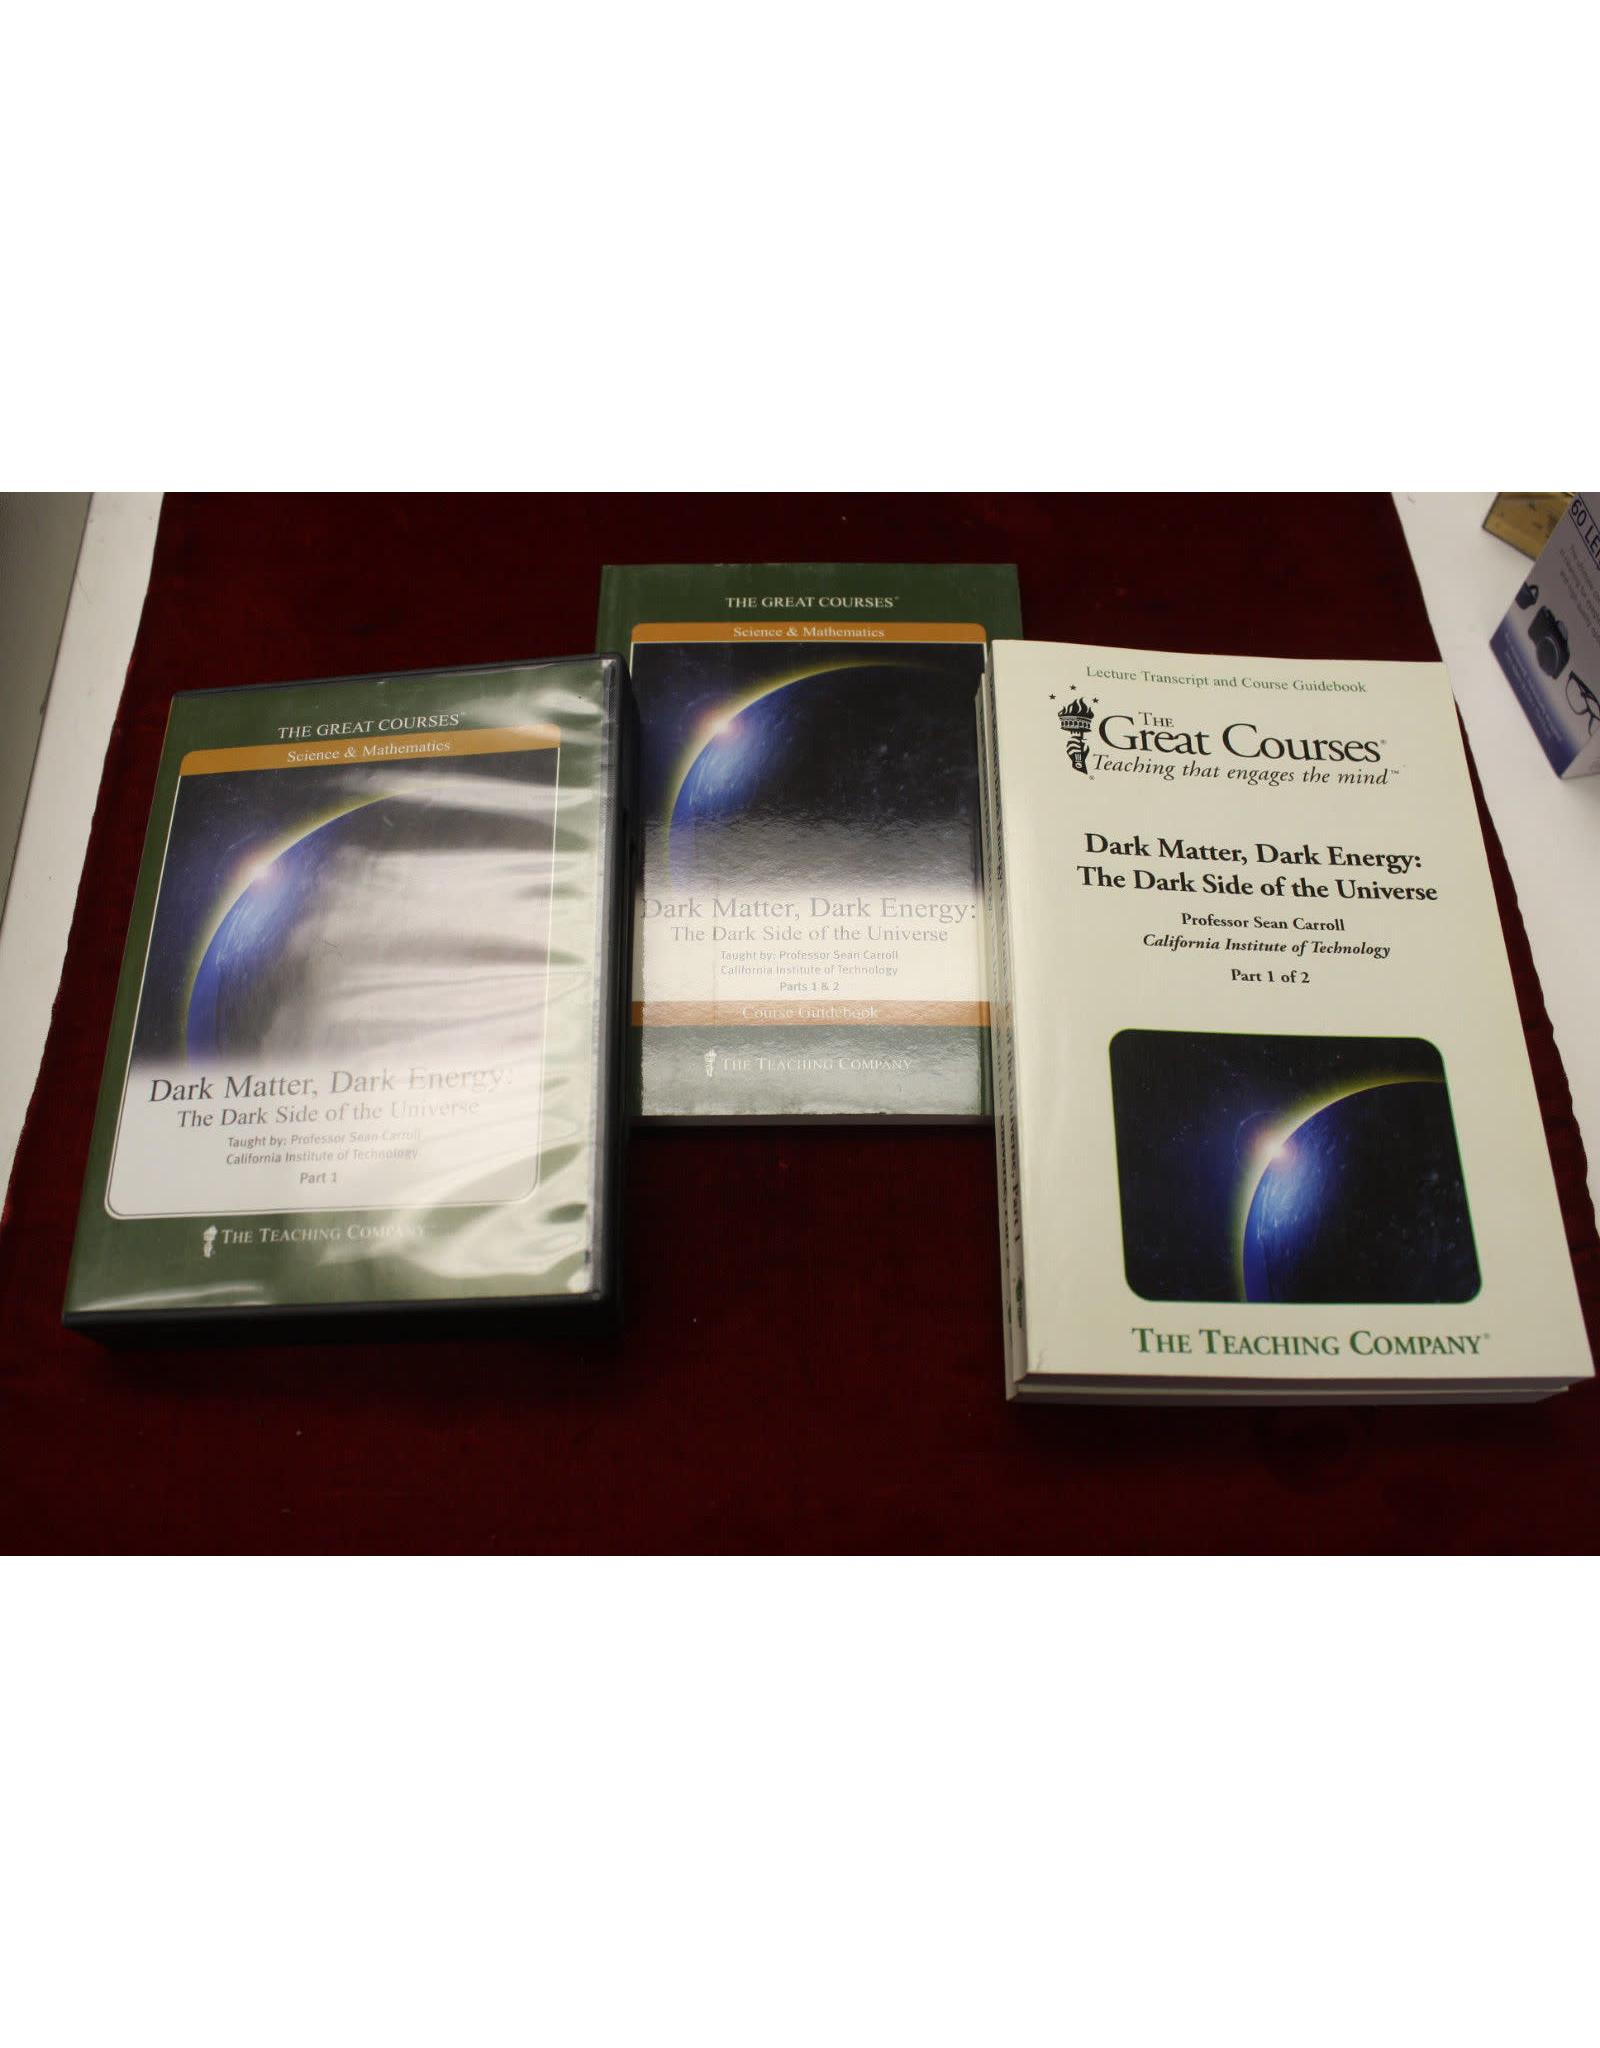 Dark Matter, Dark Energy: The Dark Side of the Universe DVD Sean Carroll (Pre-owned)